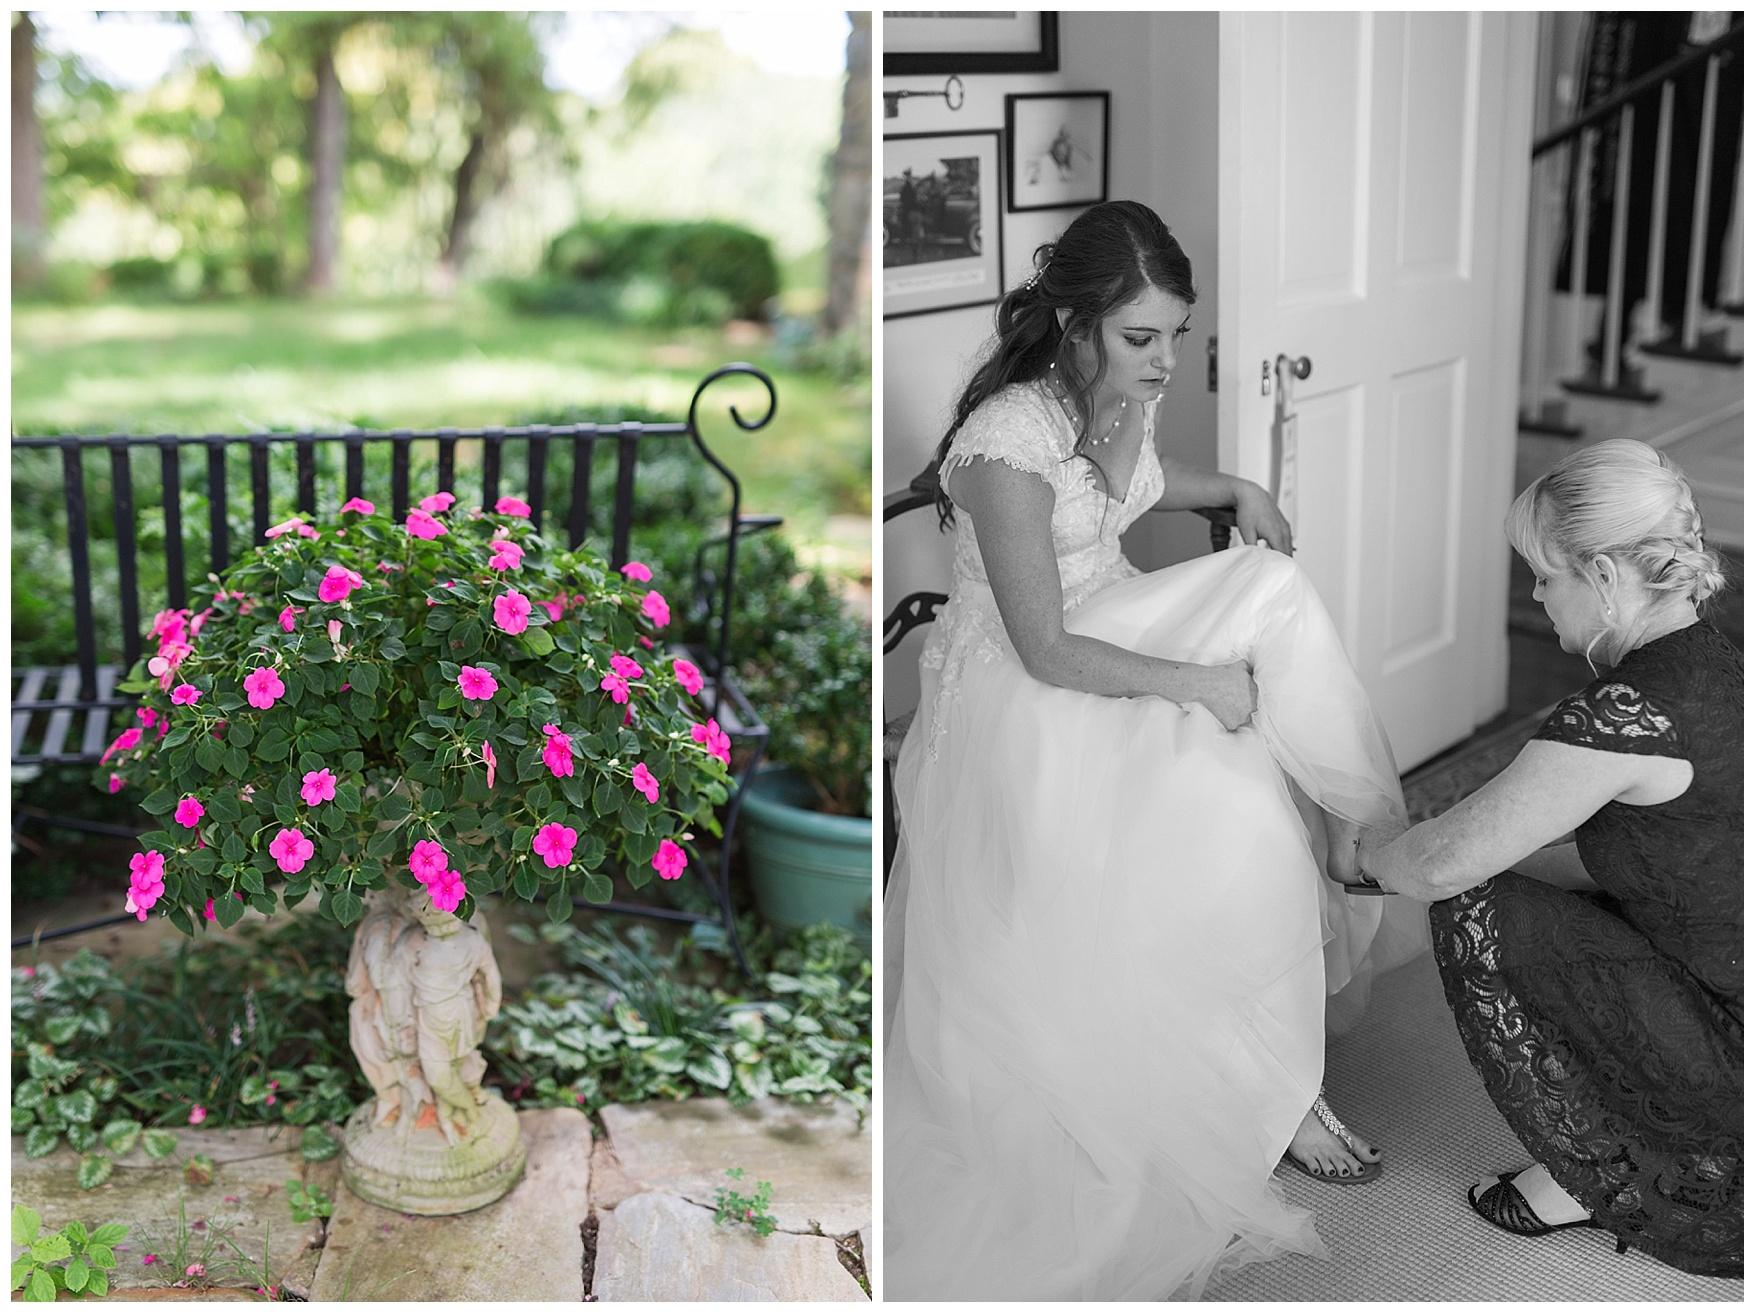 Murray Hill Wedding in Leesburg, Virginia    Leesburg Wedding Photographer    Ashley Eiban Photography